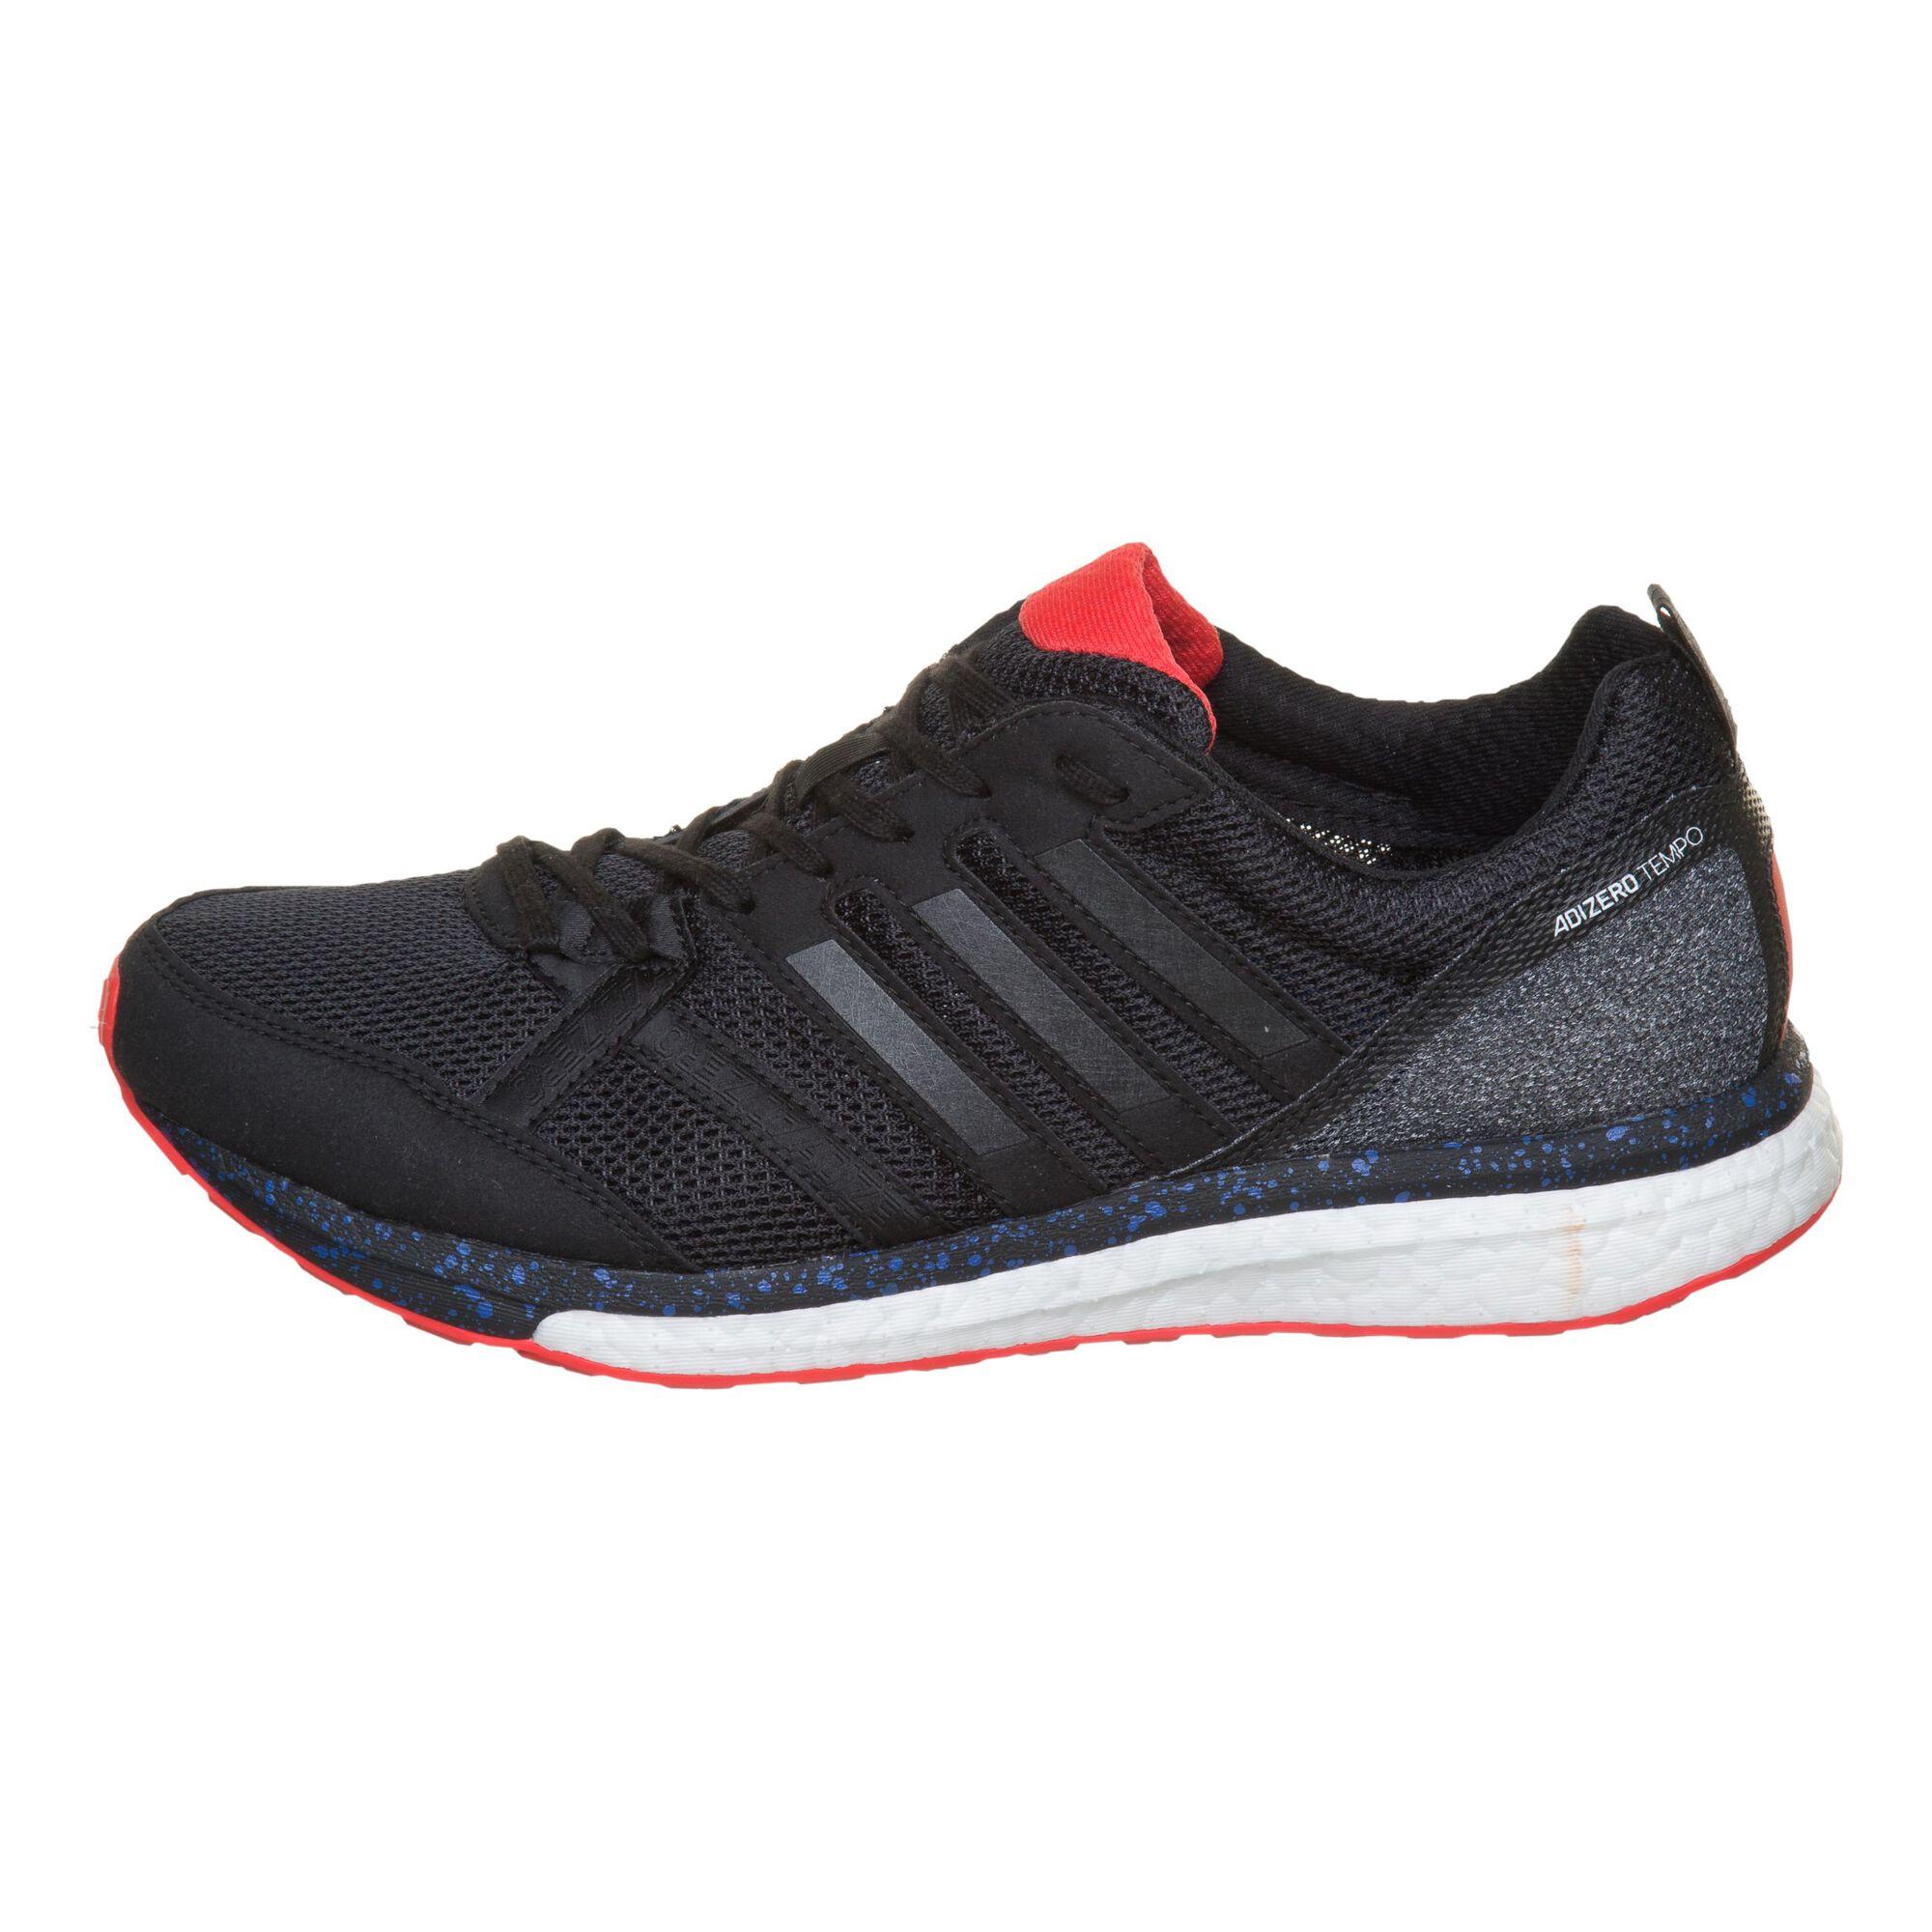 Orientar Agacharse sobresalir  buy adidas Adizero Tempo 9 Aktiv Competition Running Shoe Men - Black,  White online | Jogging-Point